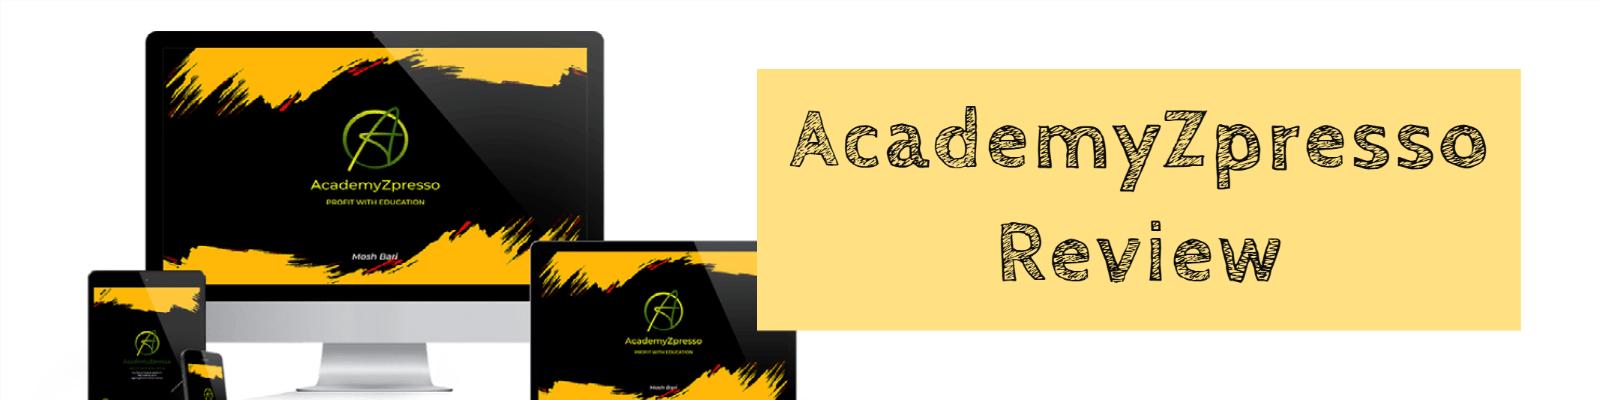 AcademyZPresso Review: Detailed Study [2020]